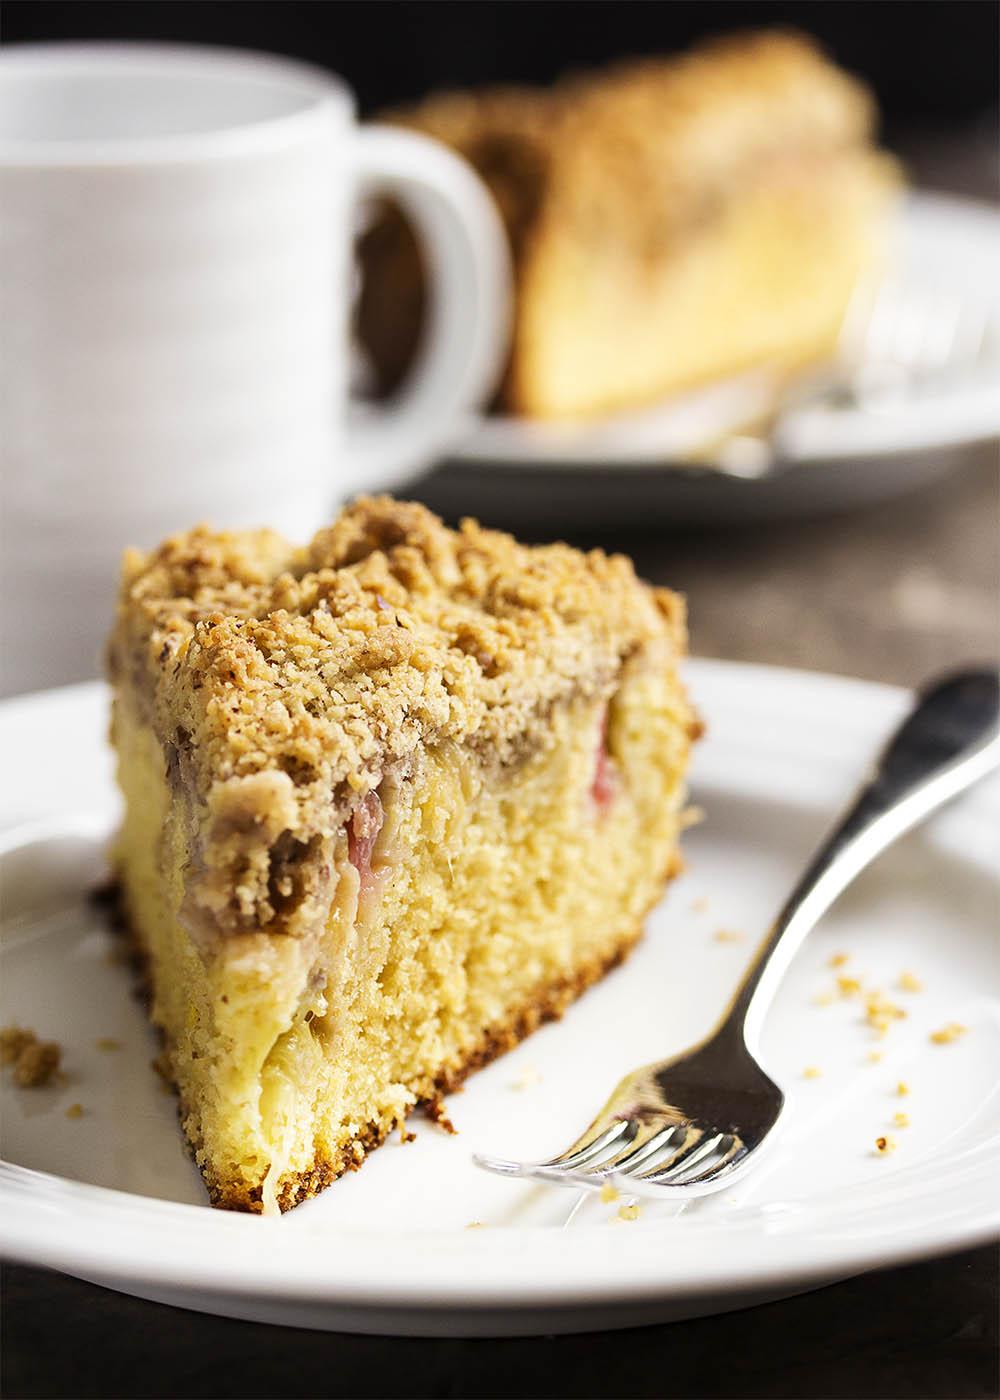 Rhubarb Coffee Cake With Crumb Topping